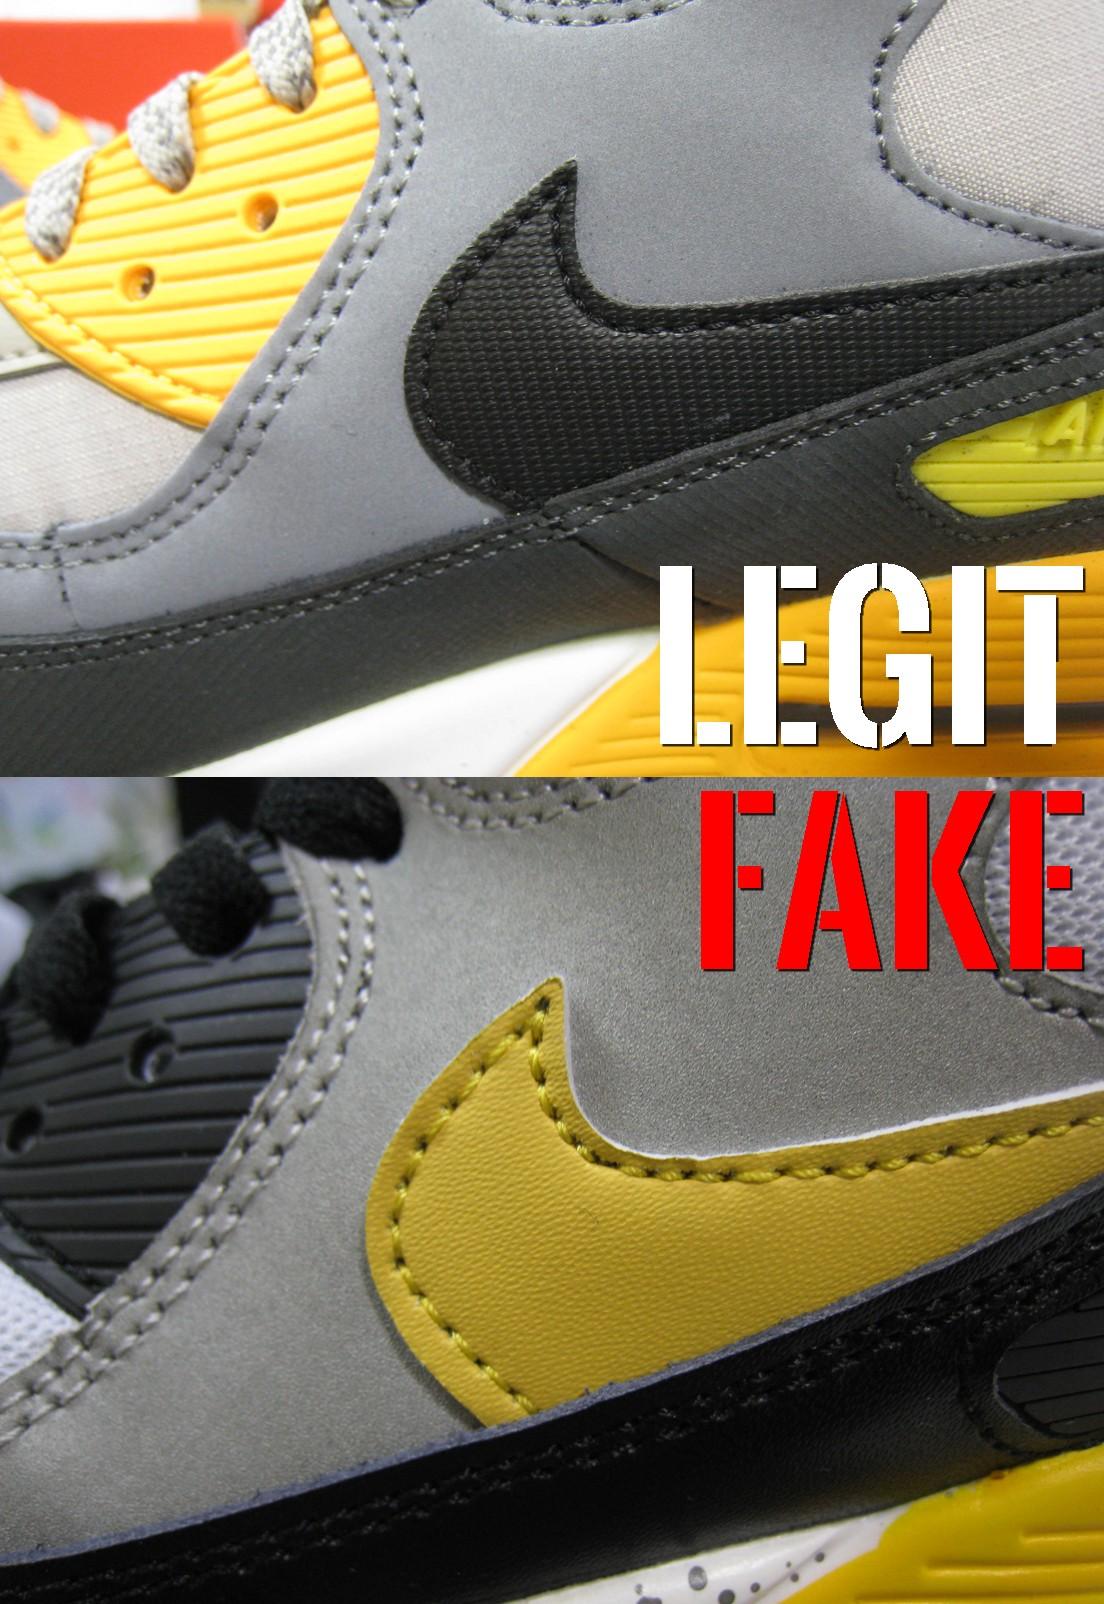 podróbka Nike Air Max 90 swoosh